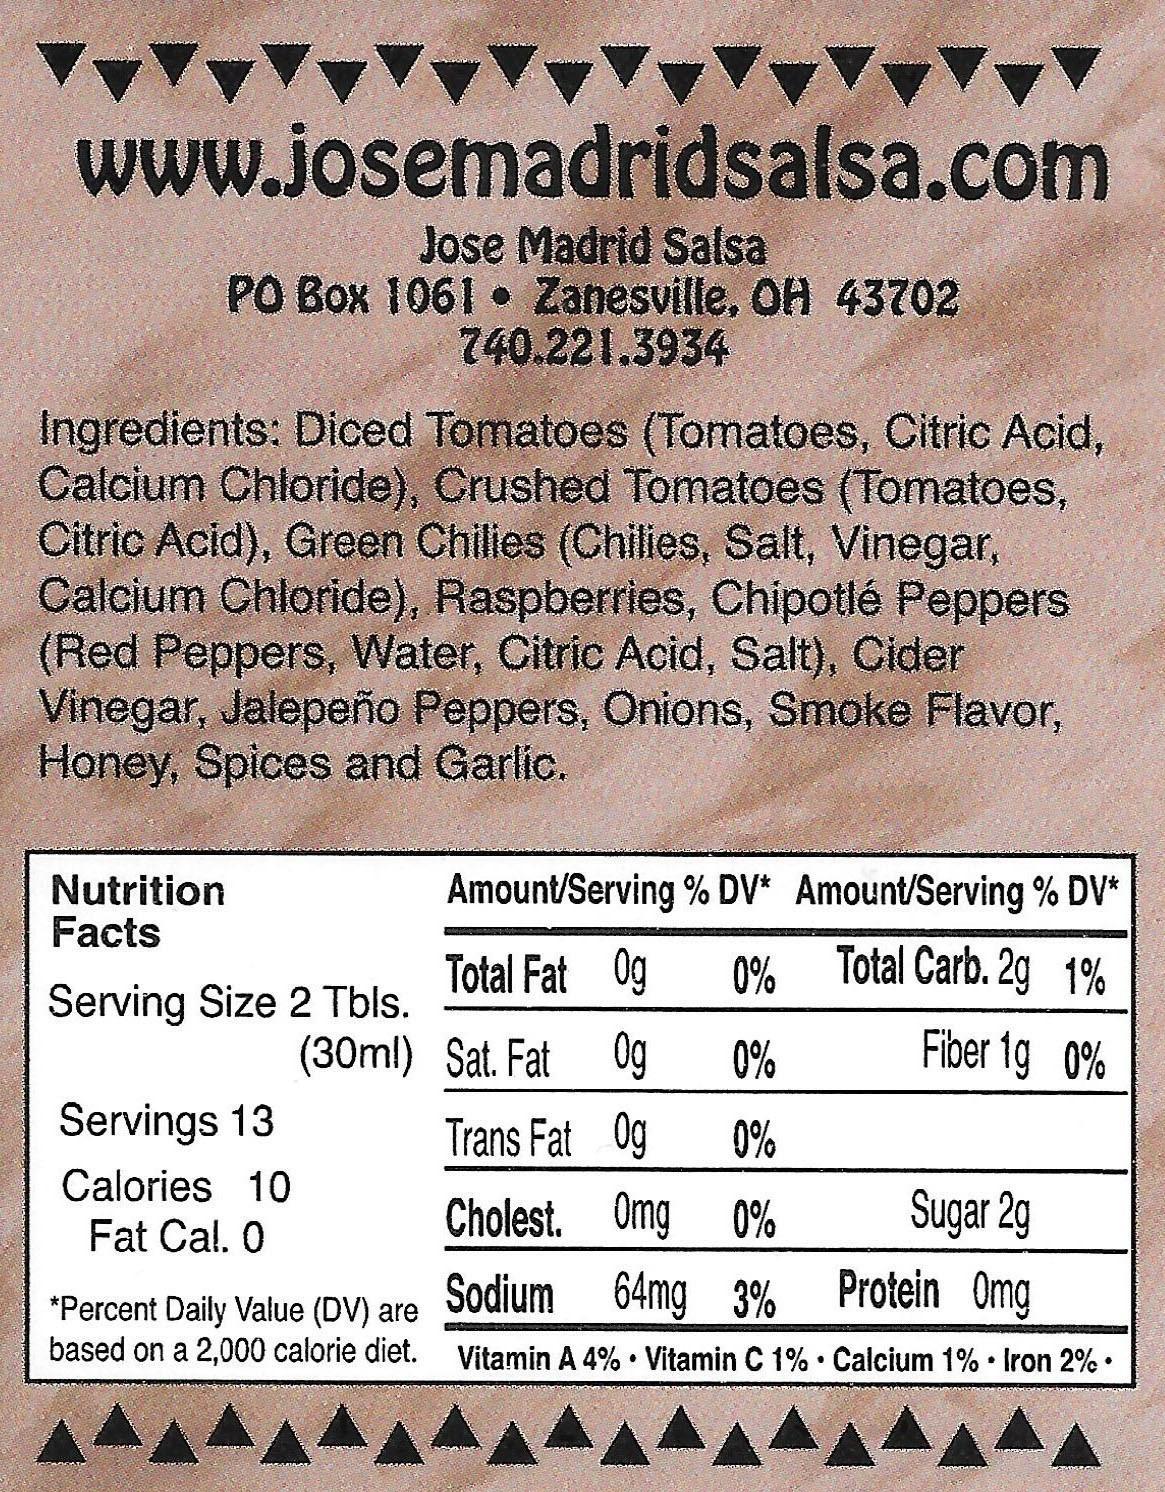 raspberry-bbq-chipotle-ingredients.jpg